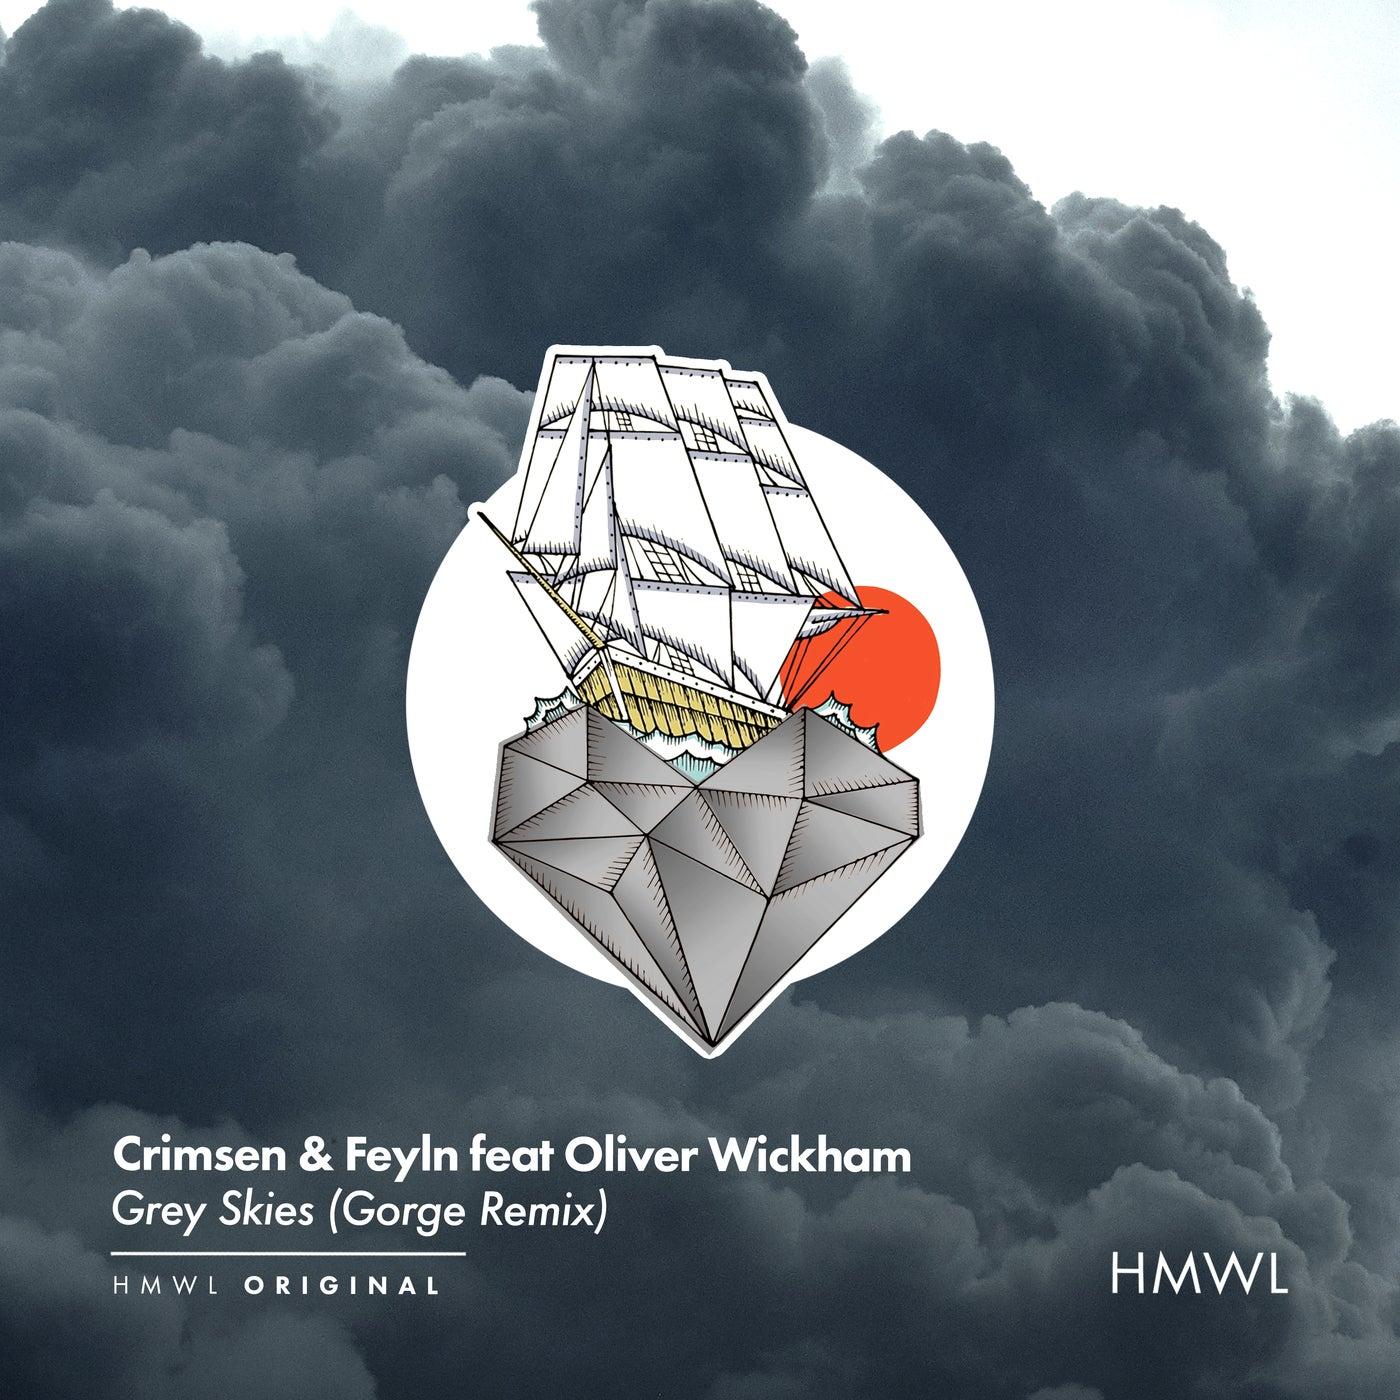 Grey Skies (Gorge Remix)